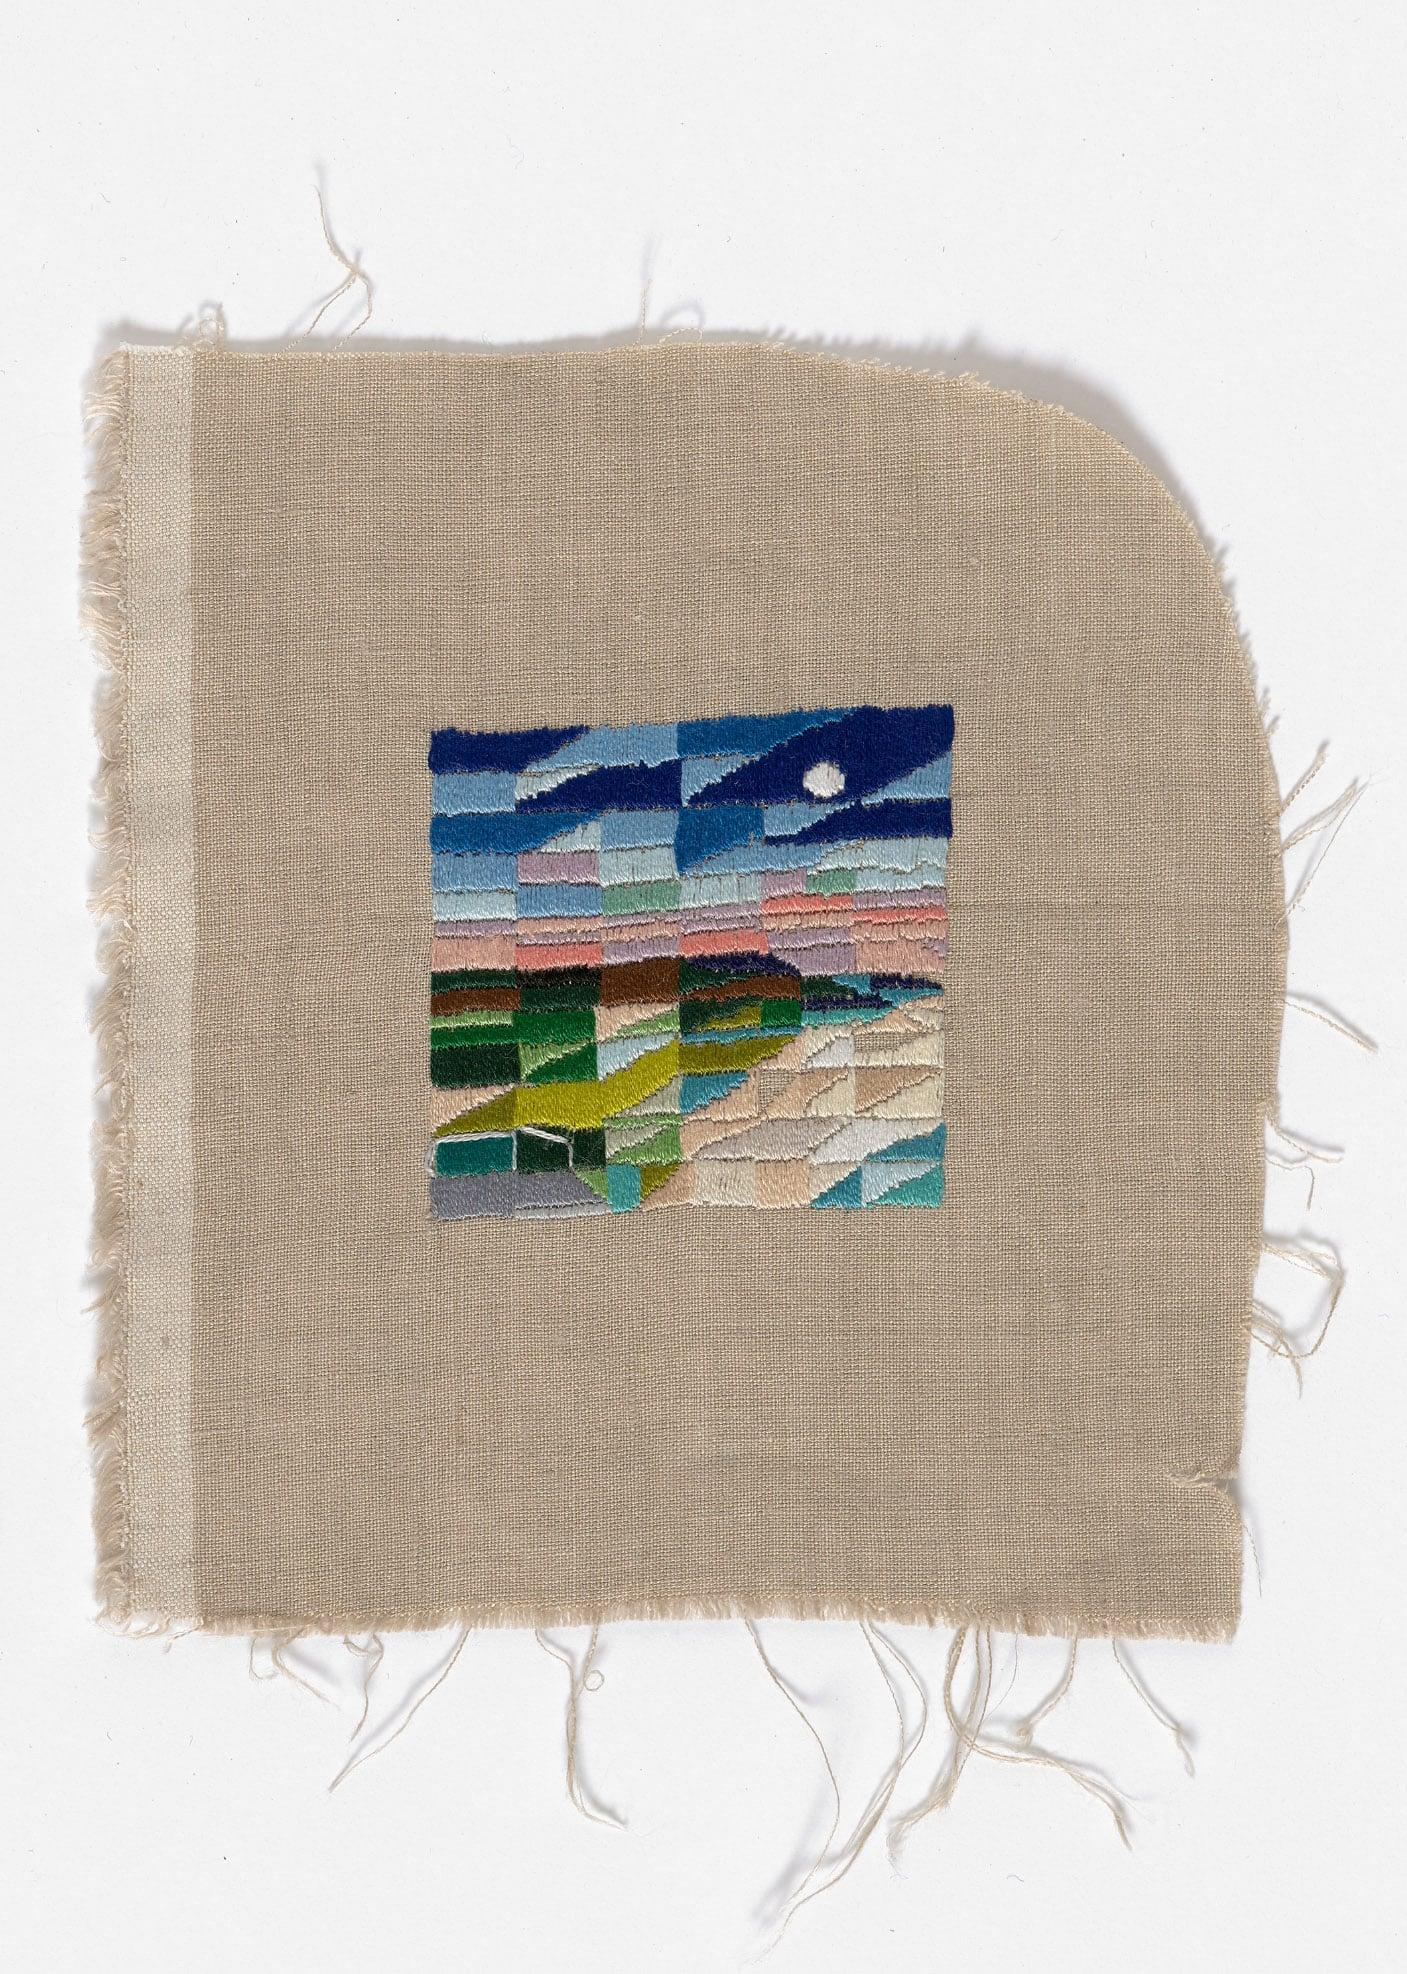 Hot Chocolate, Penguin Parade  2015 Cotton thread on linen 16.5 x 18cm